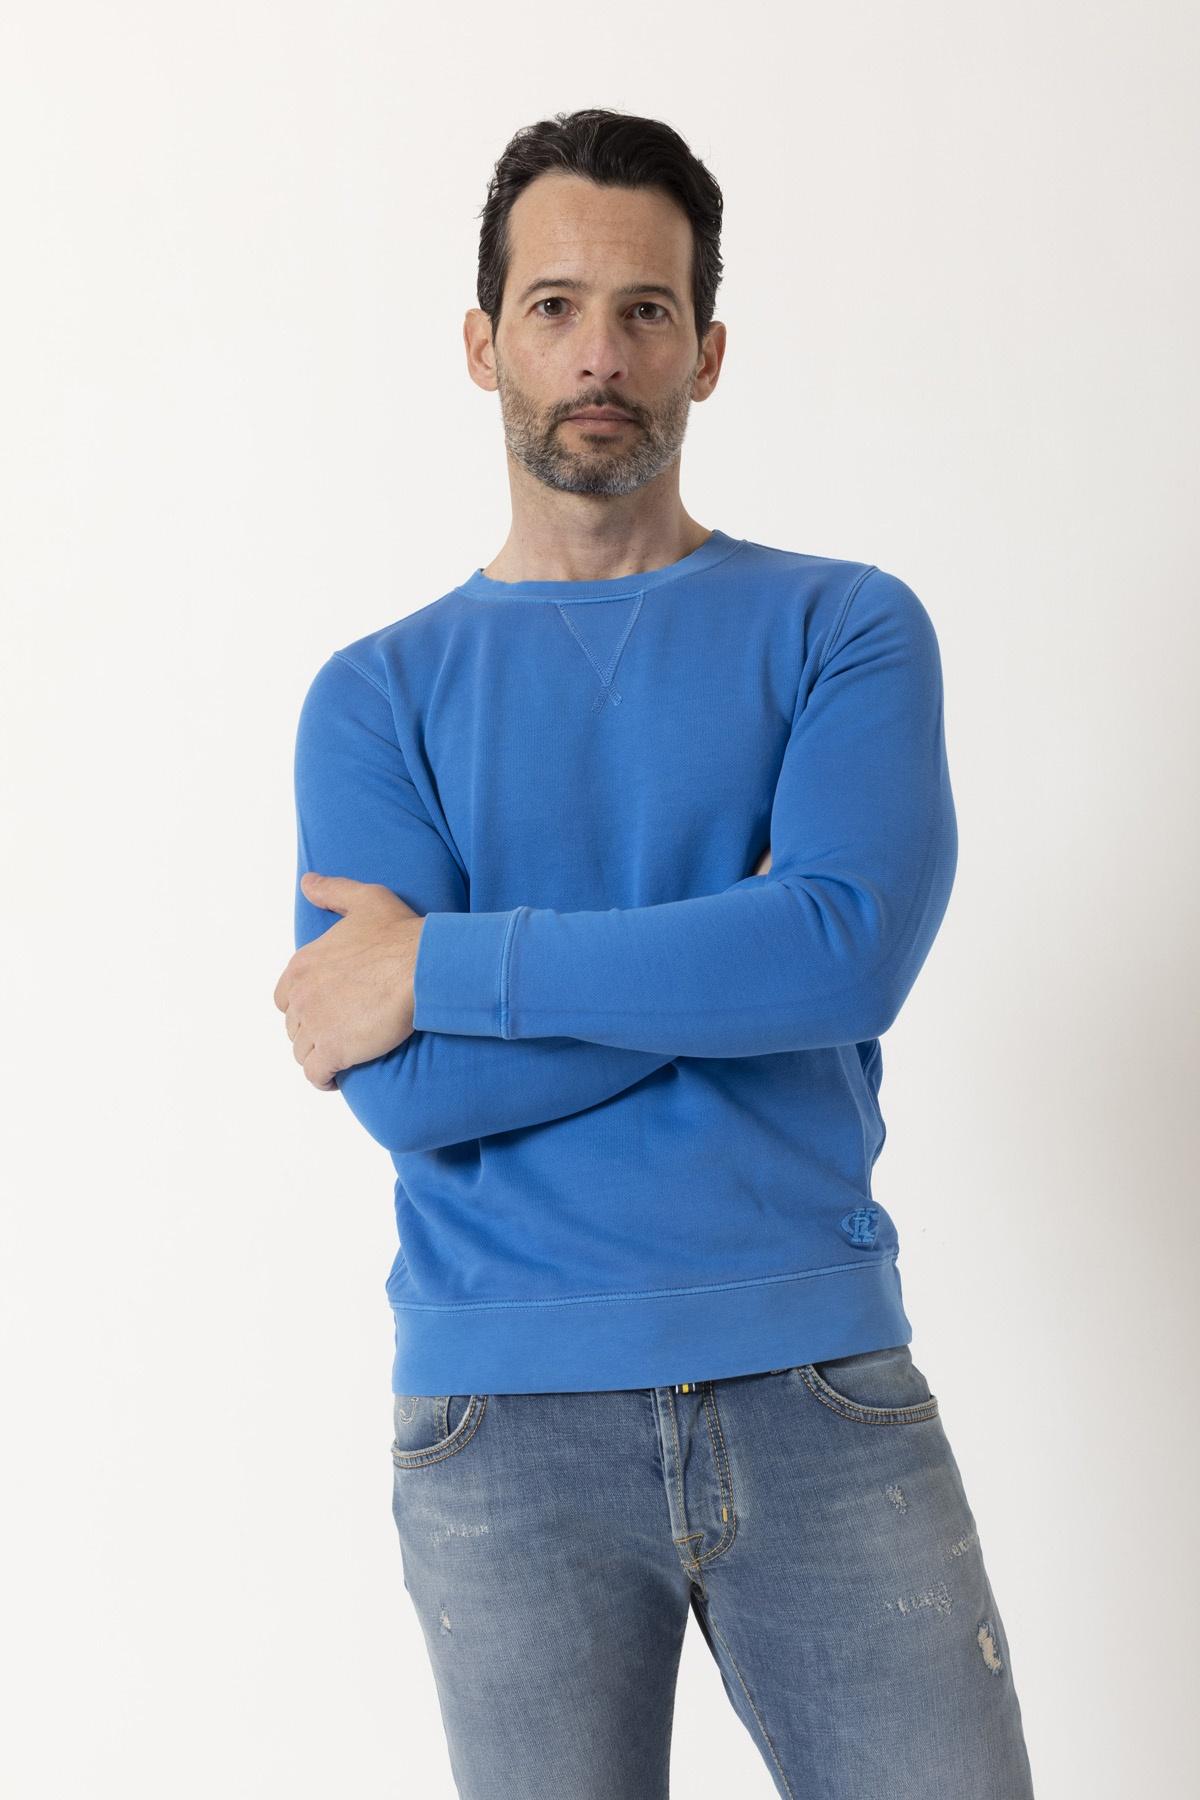 Sweatshirt for man CHARAPA S/S 21